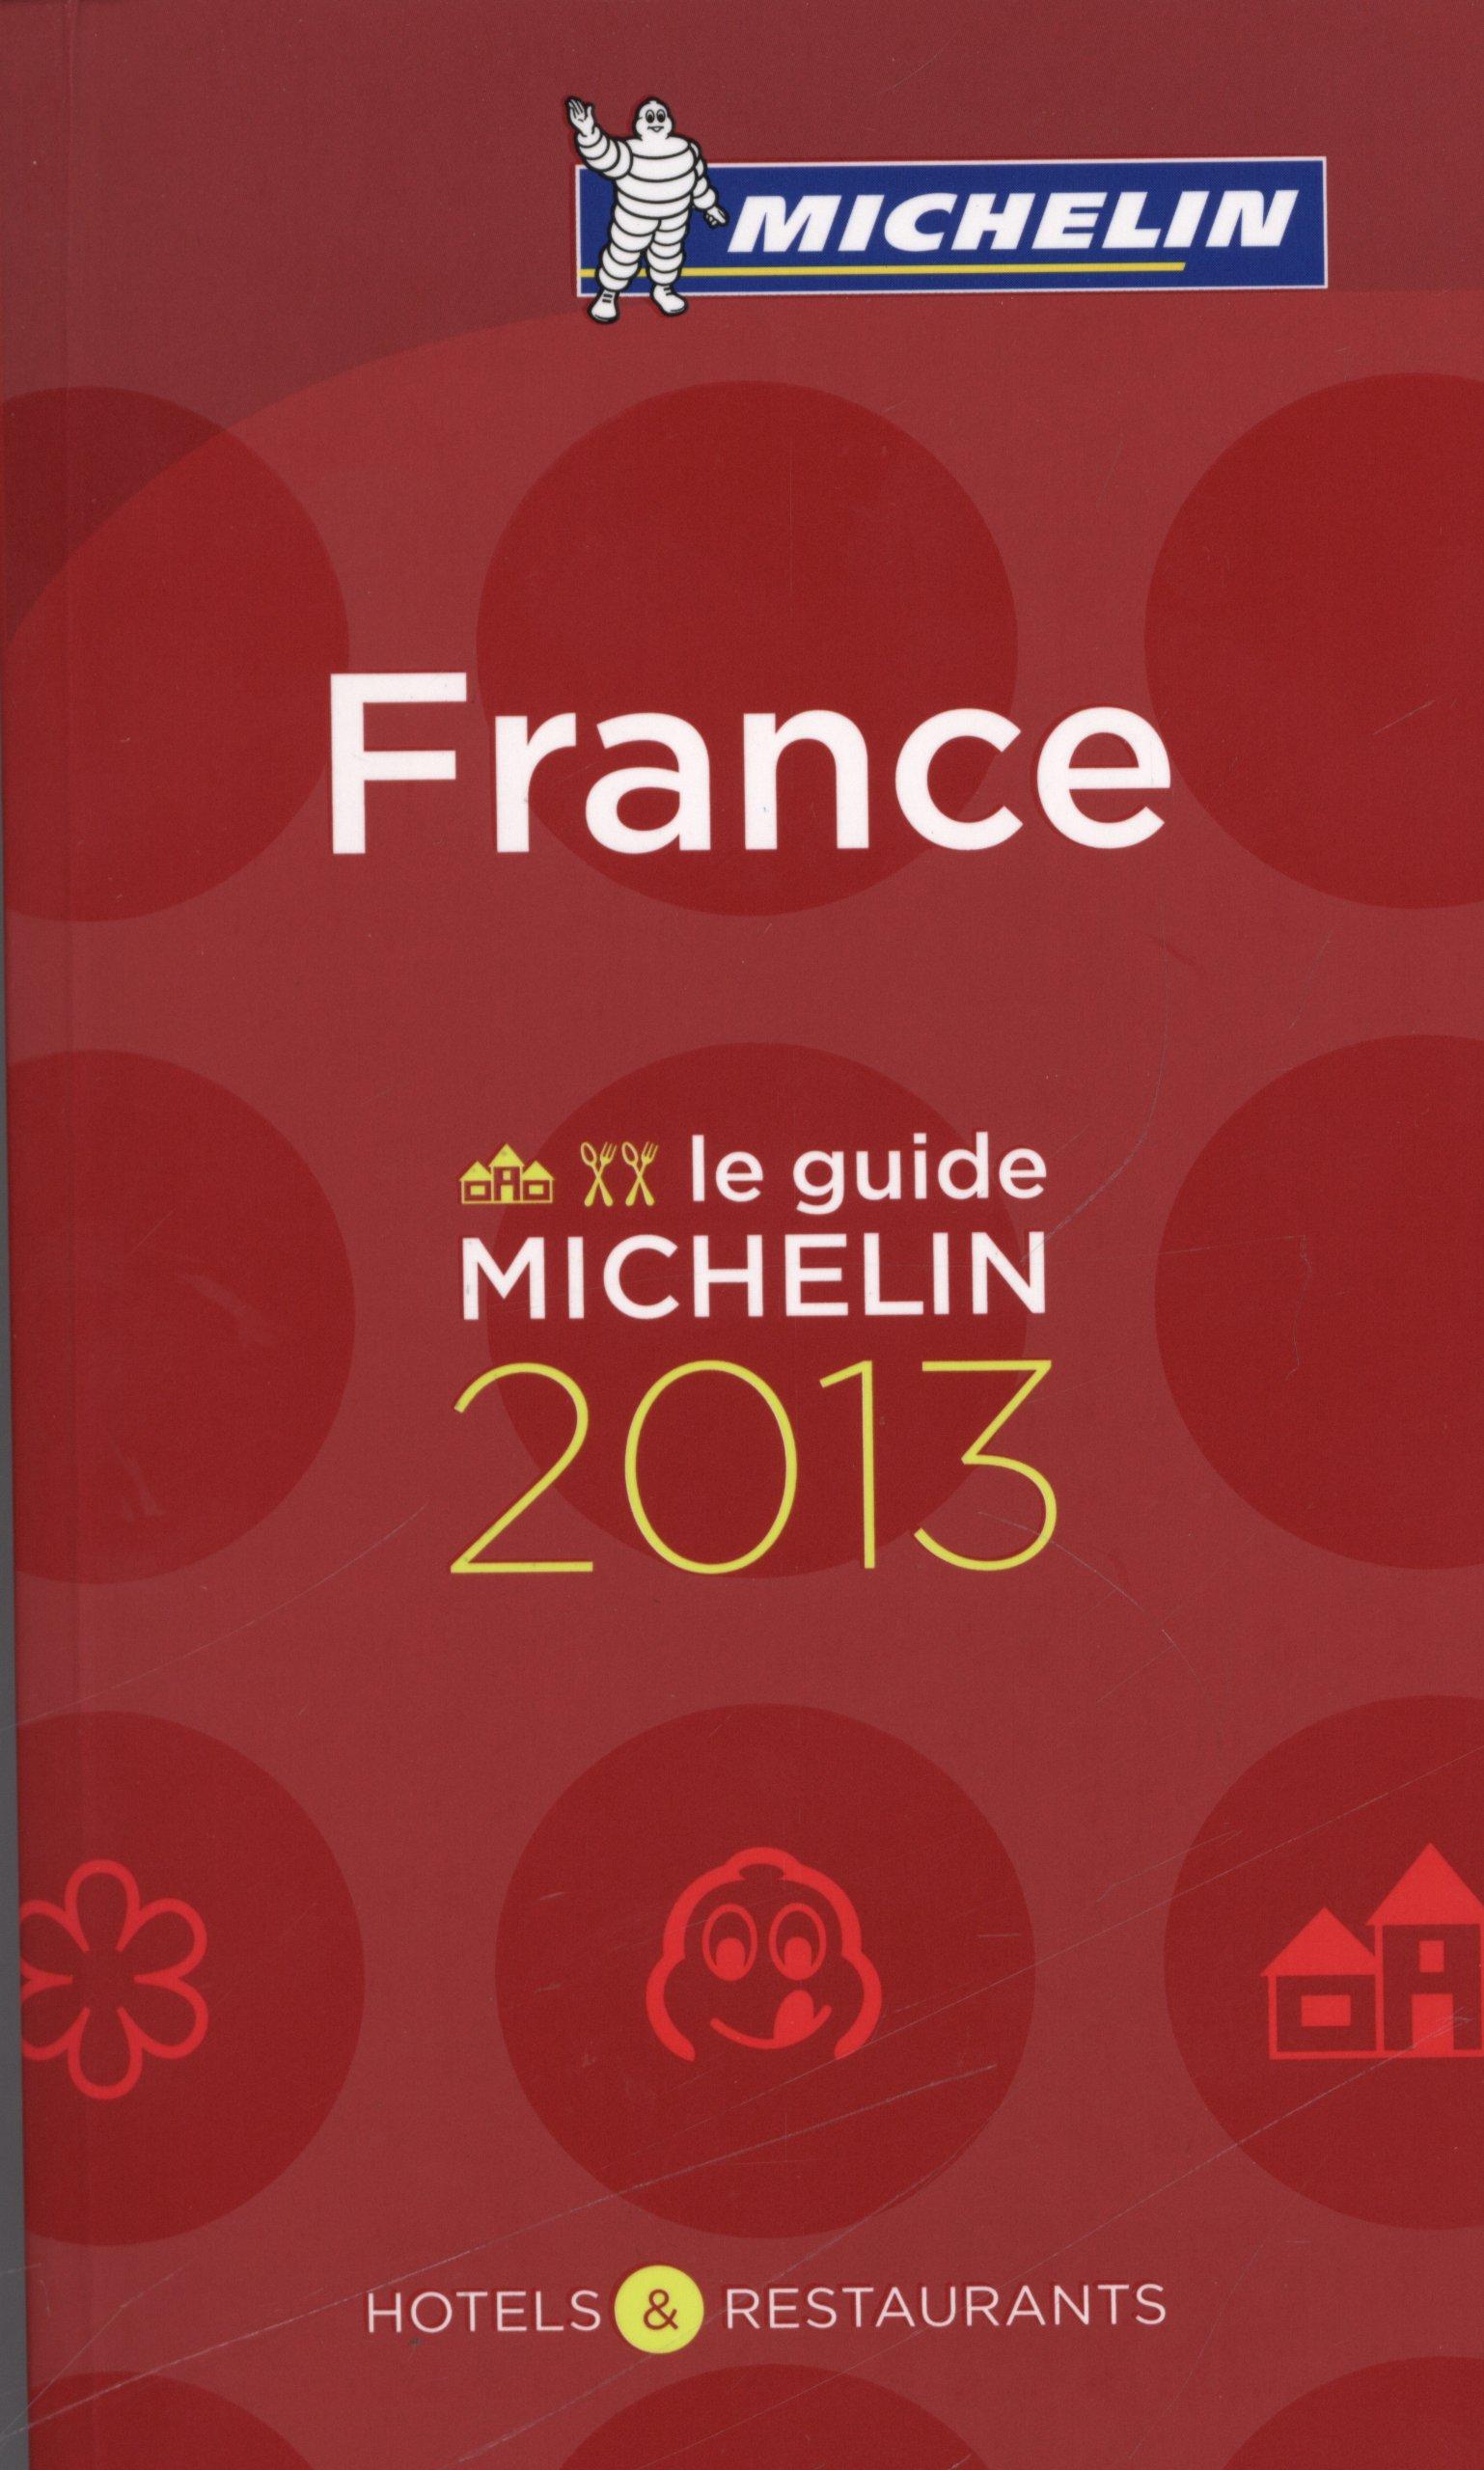 MICHELIN France 2013: Hotels & Restaurants (MICHELIN Hotelführer)